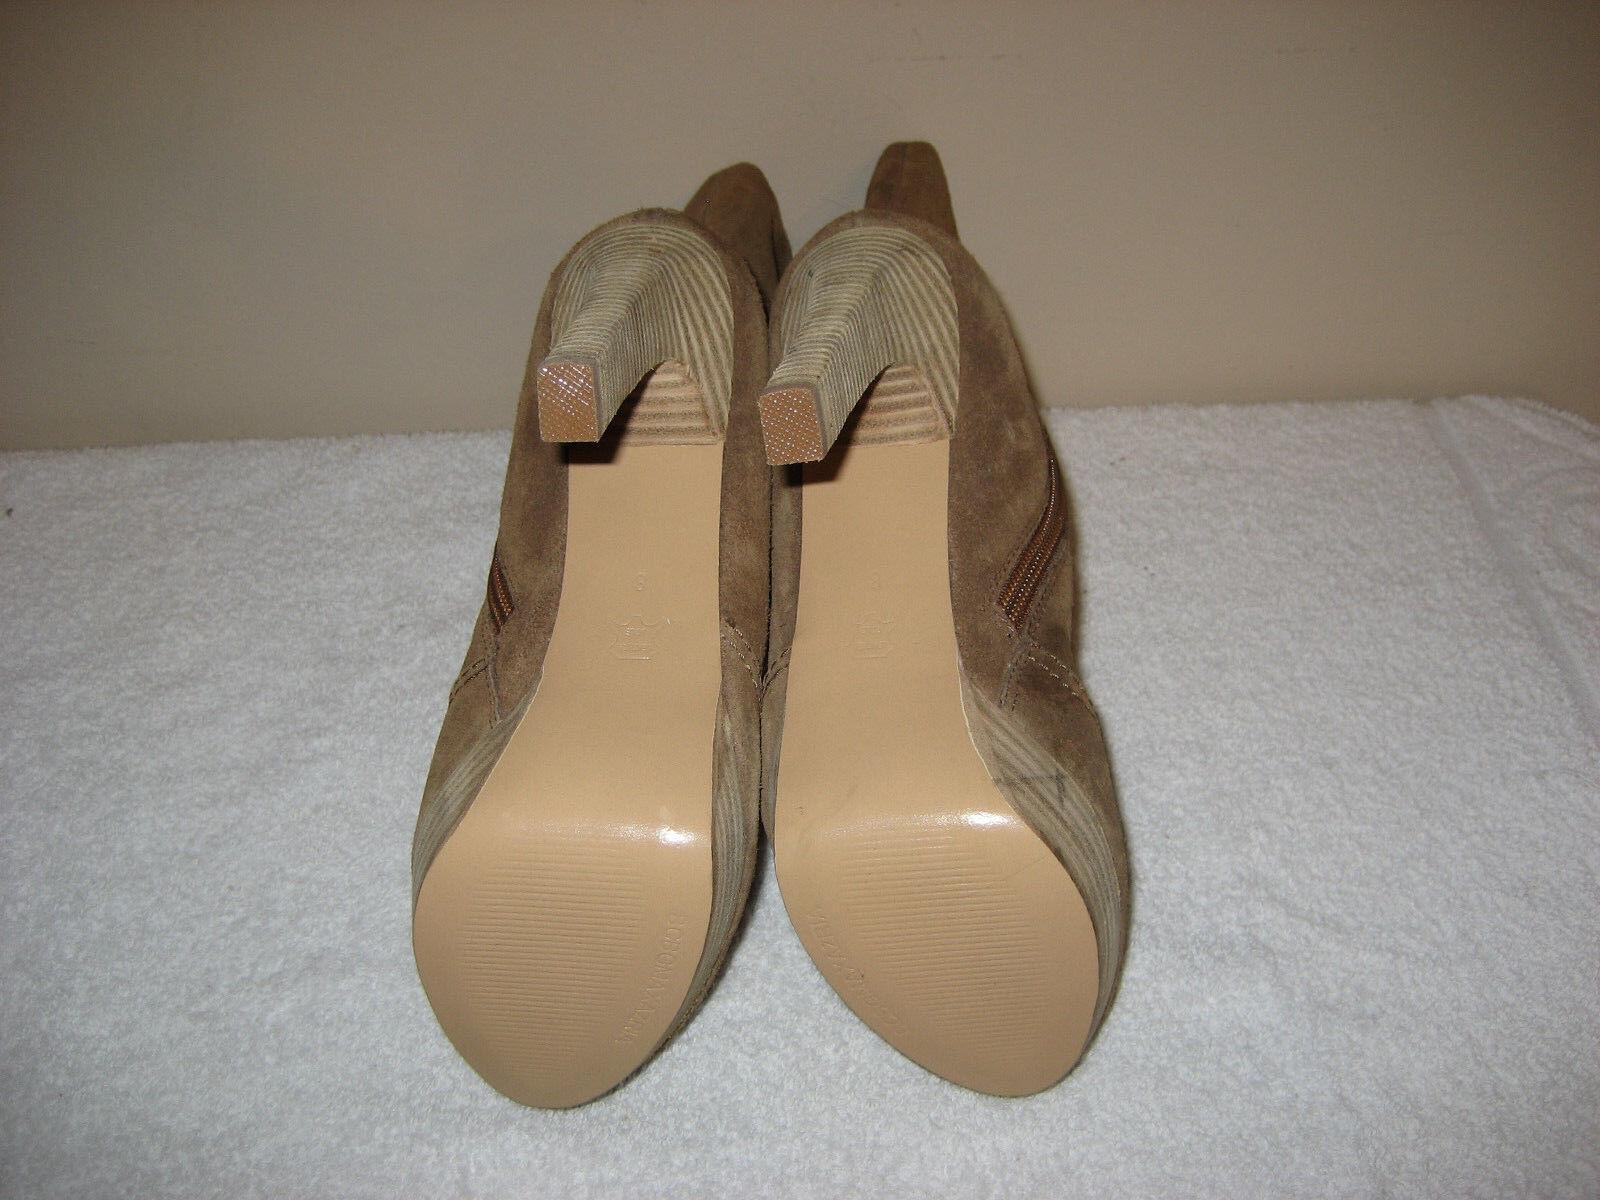 Brown Suede BCBG AUBREY ALL LEATHER TALL Heel Heel Heel Boots SIZE 8 975a9e